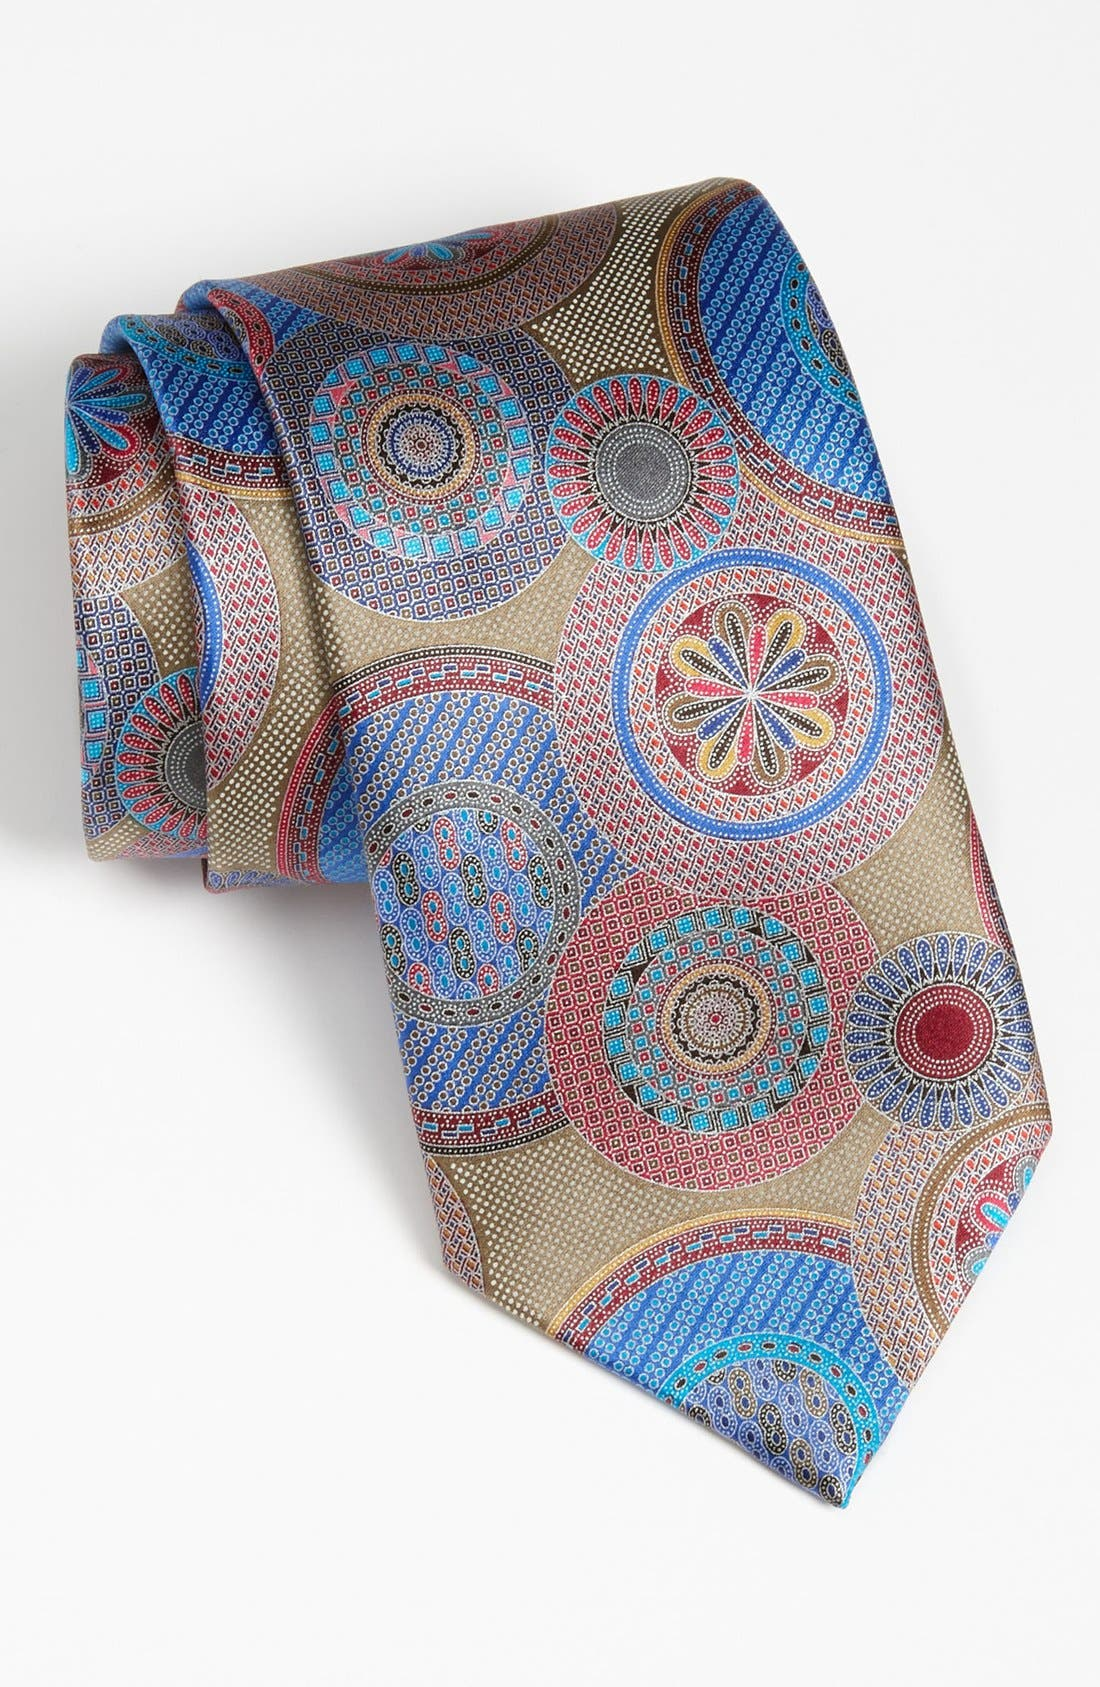 Main Image - Ermenegildo Zegna 'Quindici' Woven Silk Tie